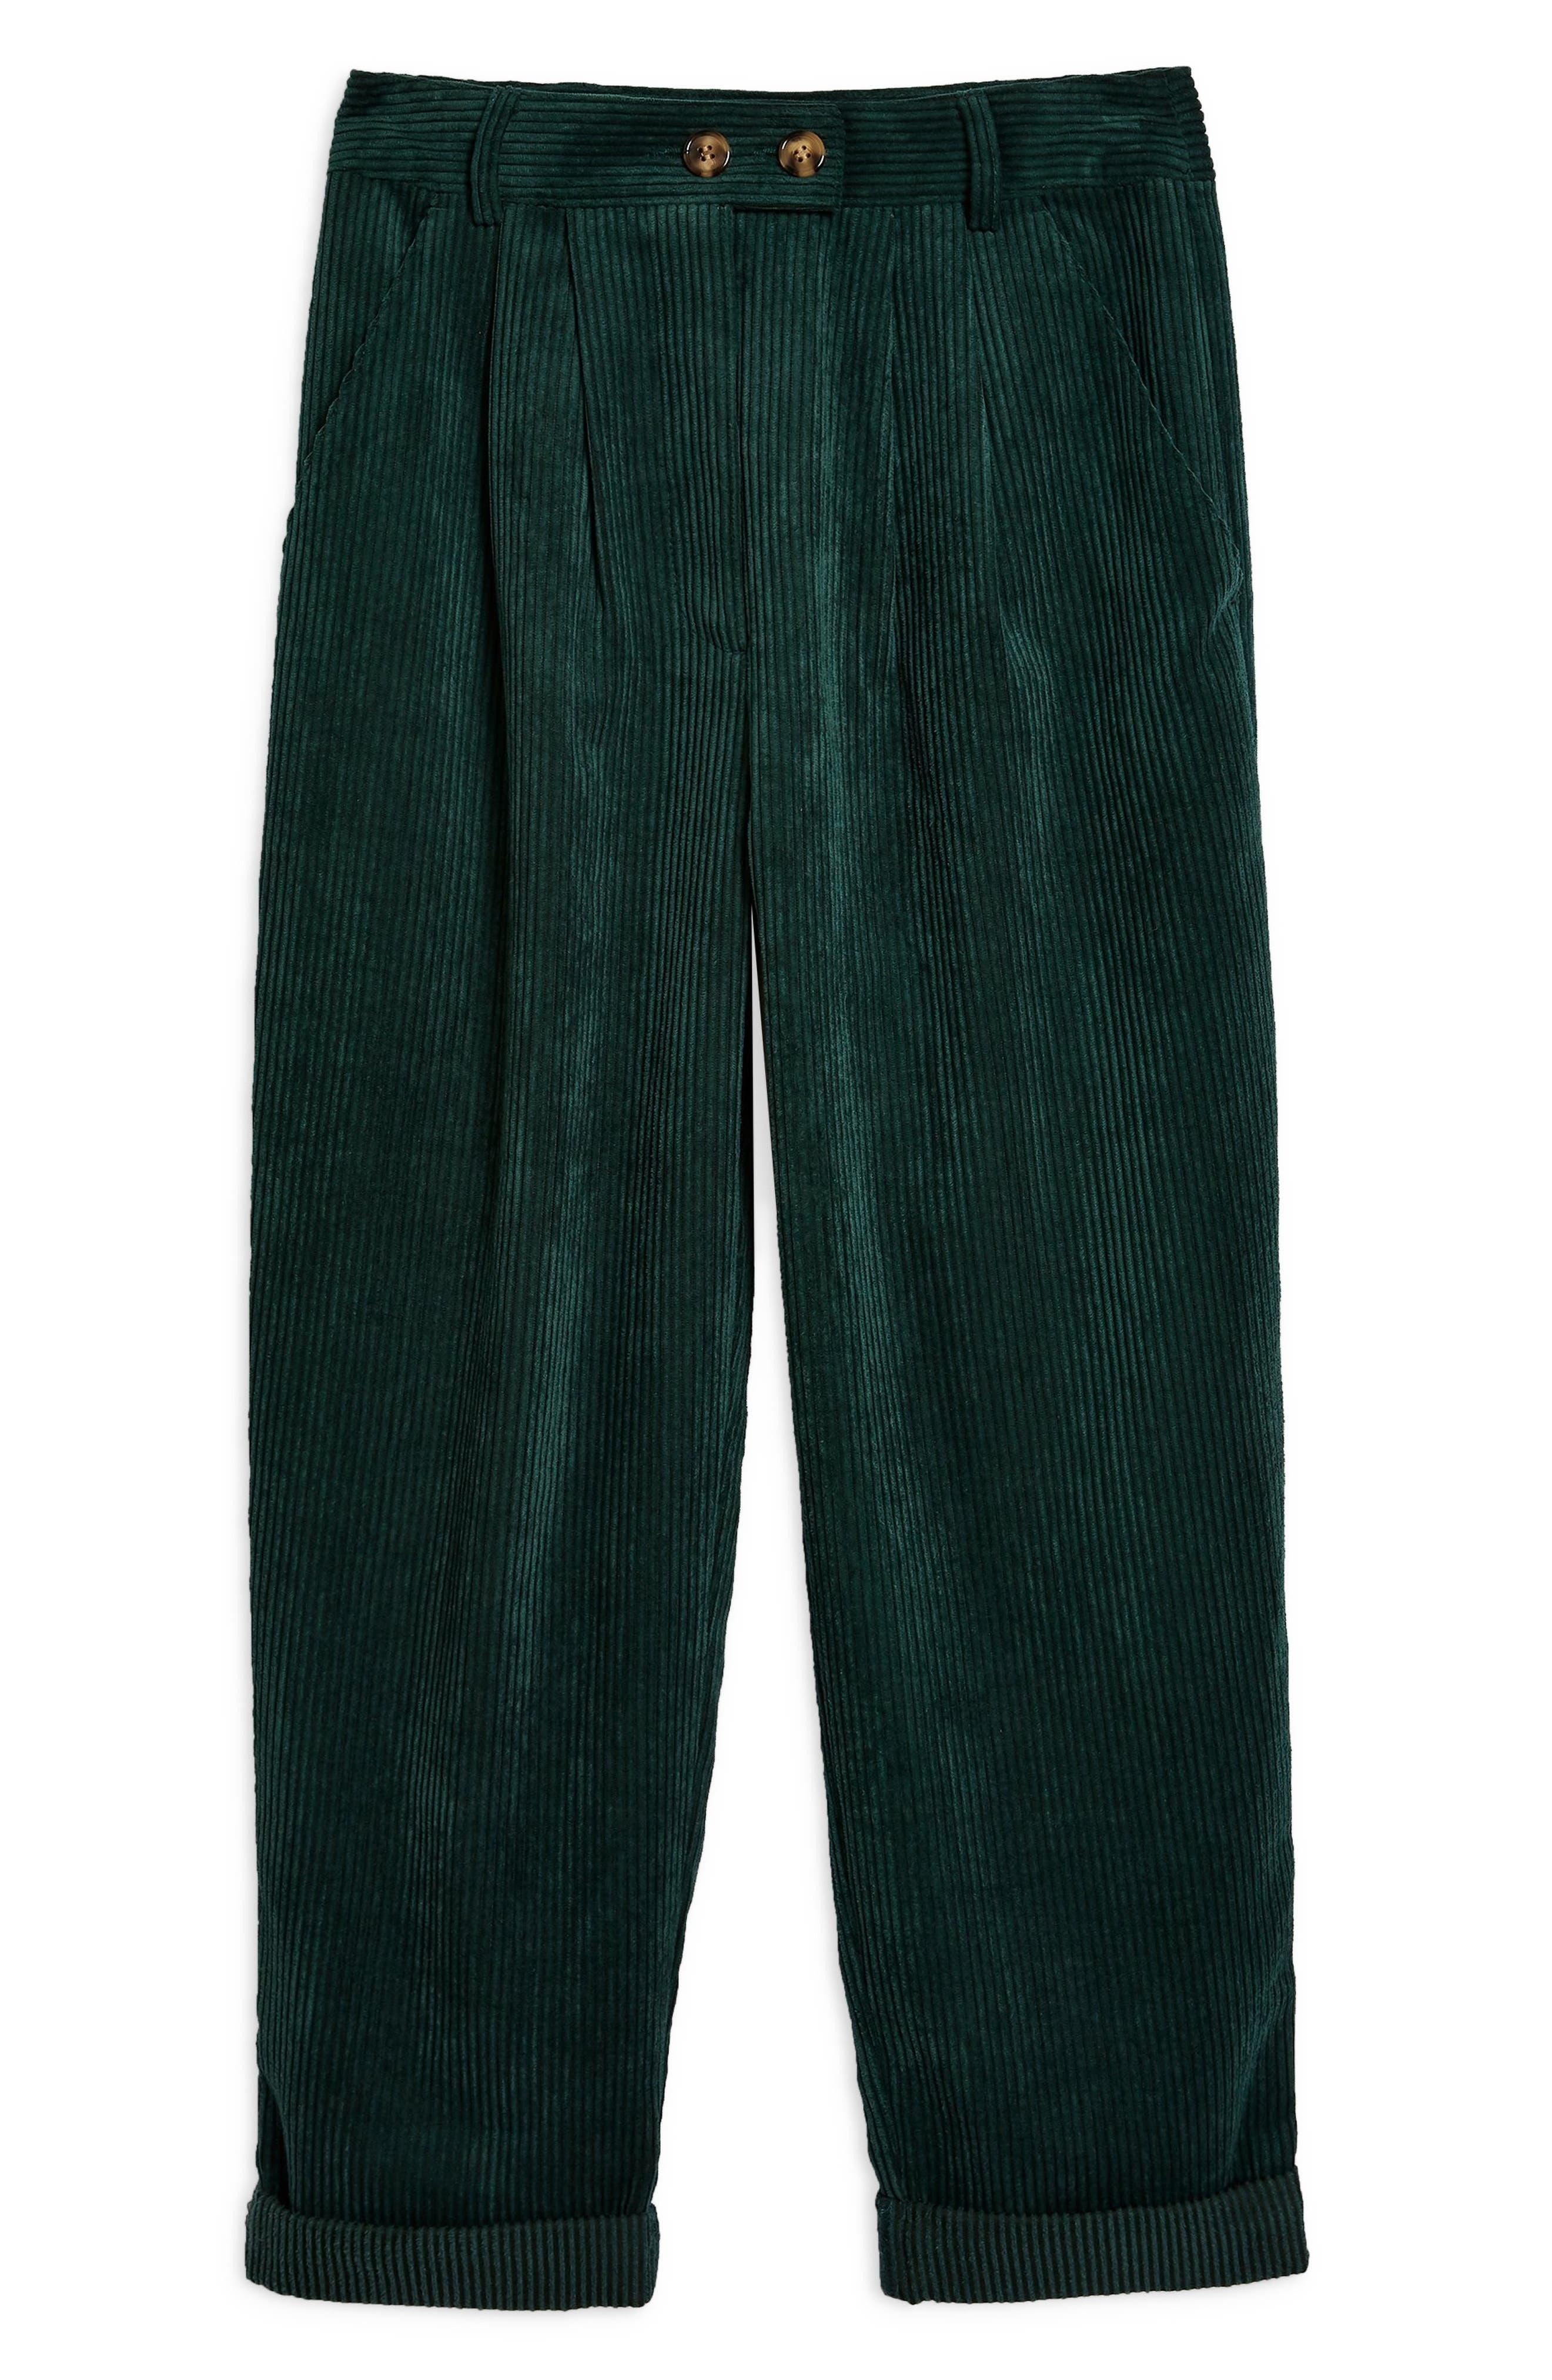 Corduroy Peg Trousers,                             Alternate thumbnail 3, color,                             301